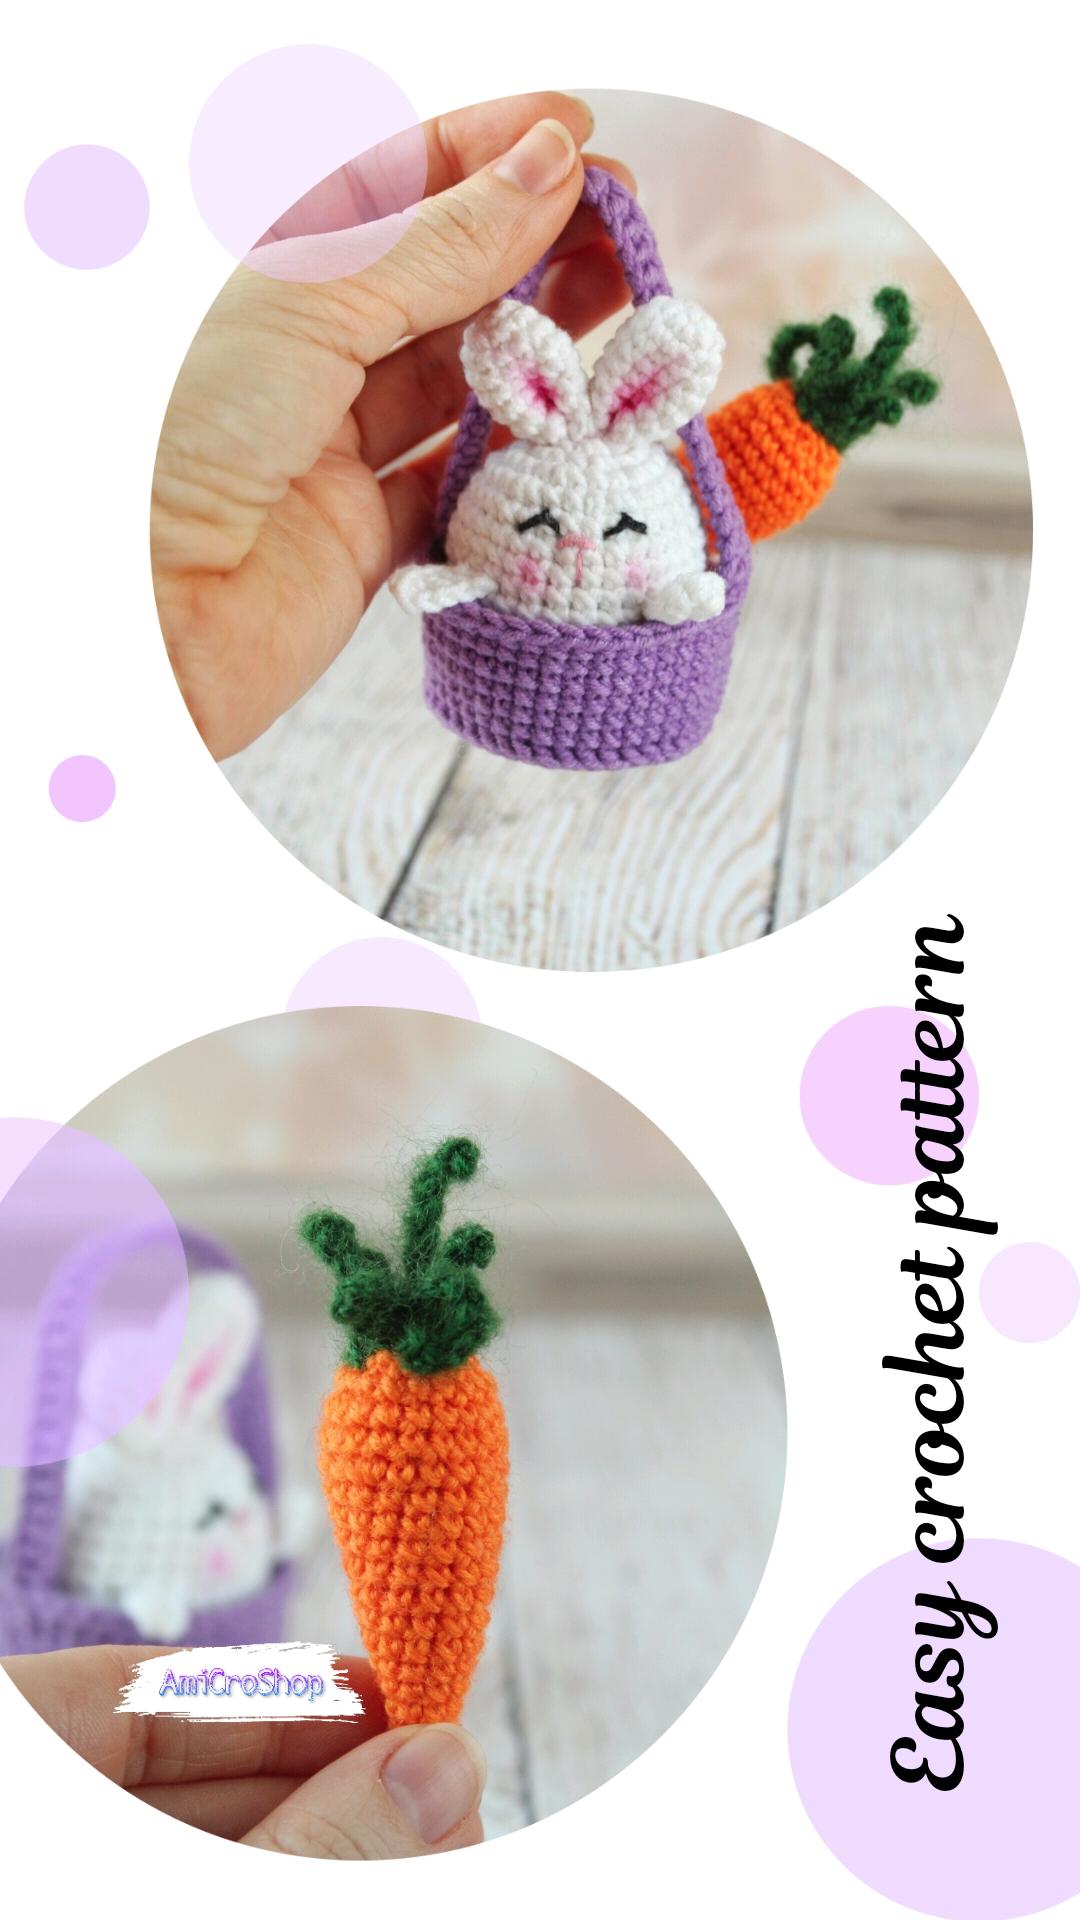 The Cutest Amigurumi — Easy Patterns and Tutorials   Crochet patterns  amigurumi, Crochet elephant, Easy crochet animals   1920x1080